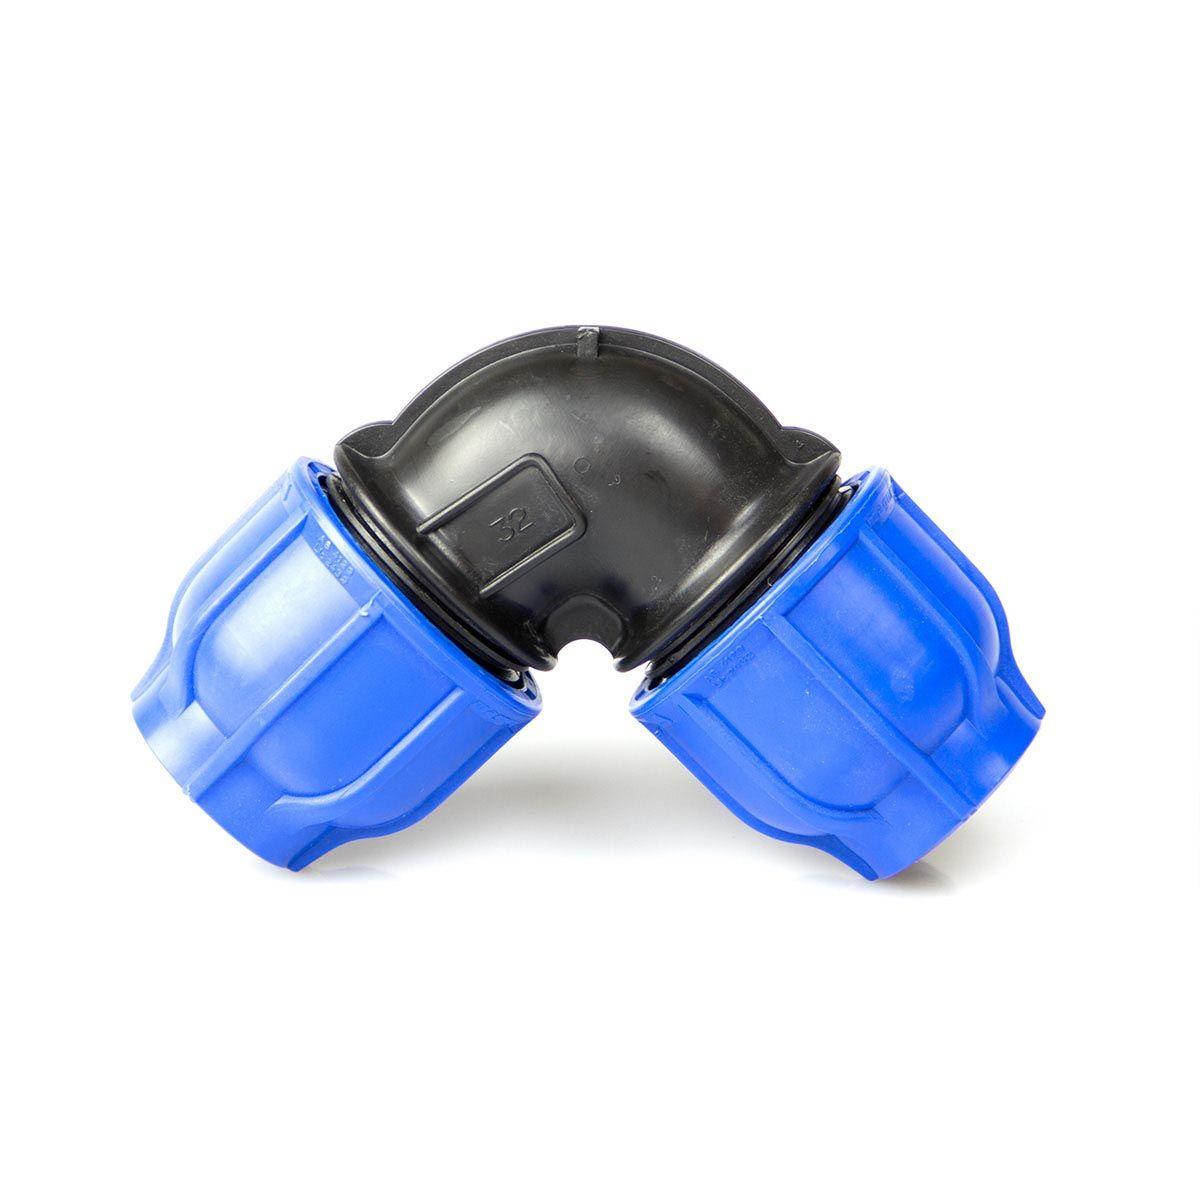 Winkel 90°, aus PP, blau-schwarz, d 20 mm, PN 16